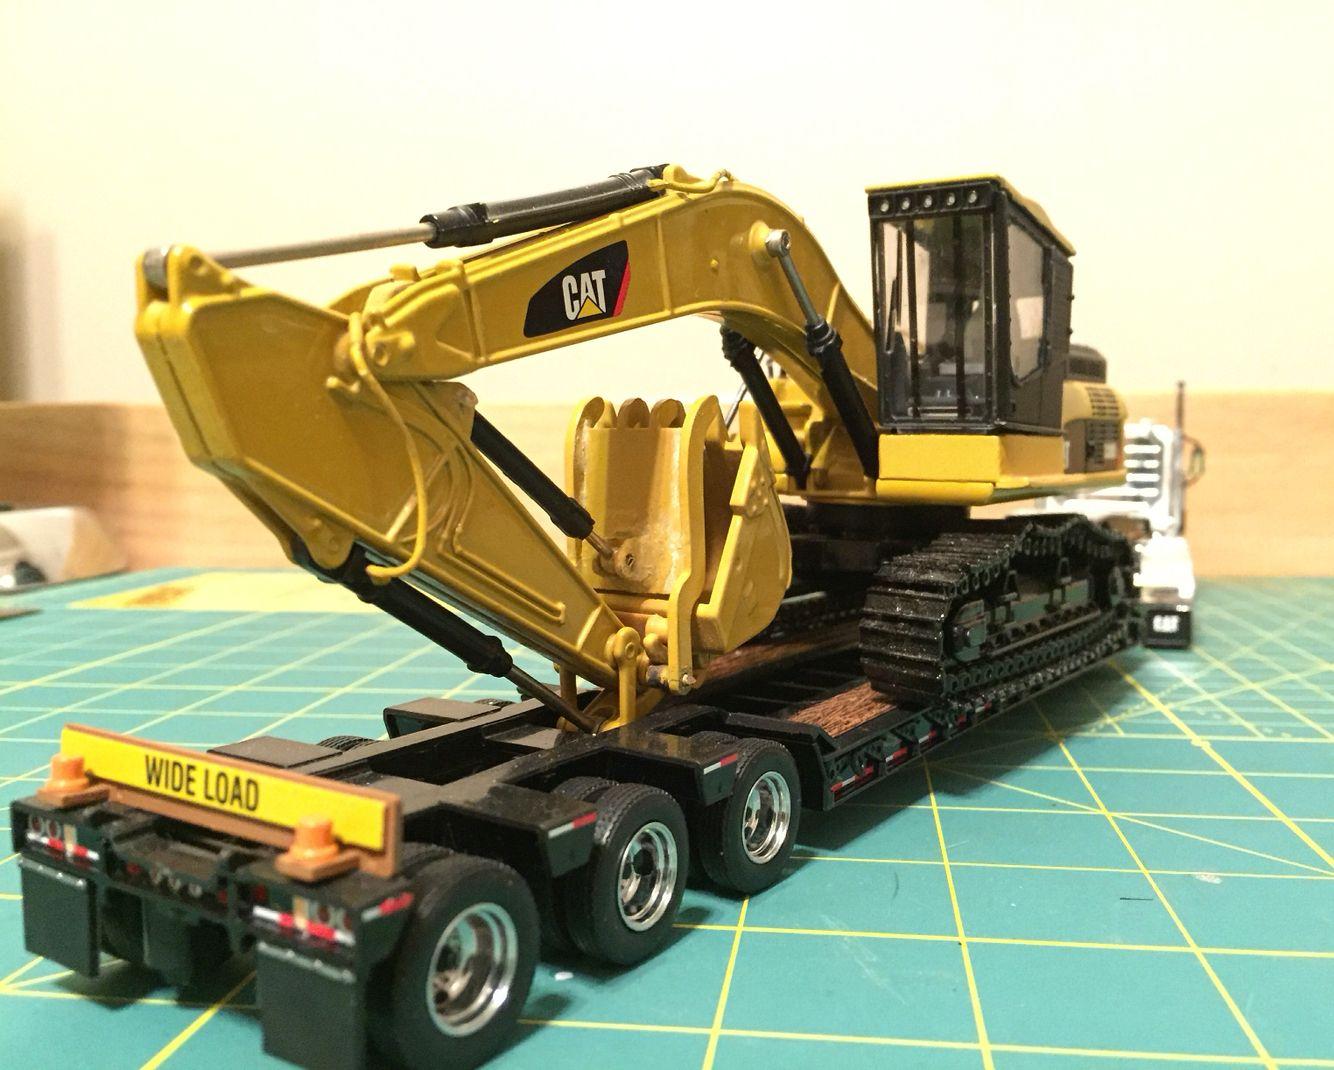 Cat 330 roadbuilder | Diecast construction | Rc construction